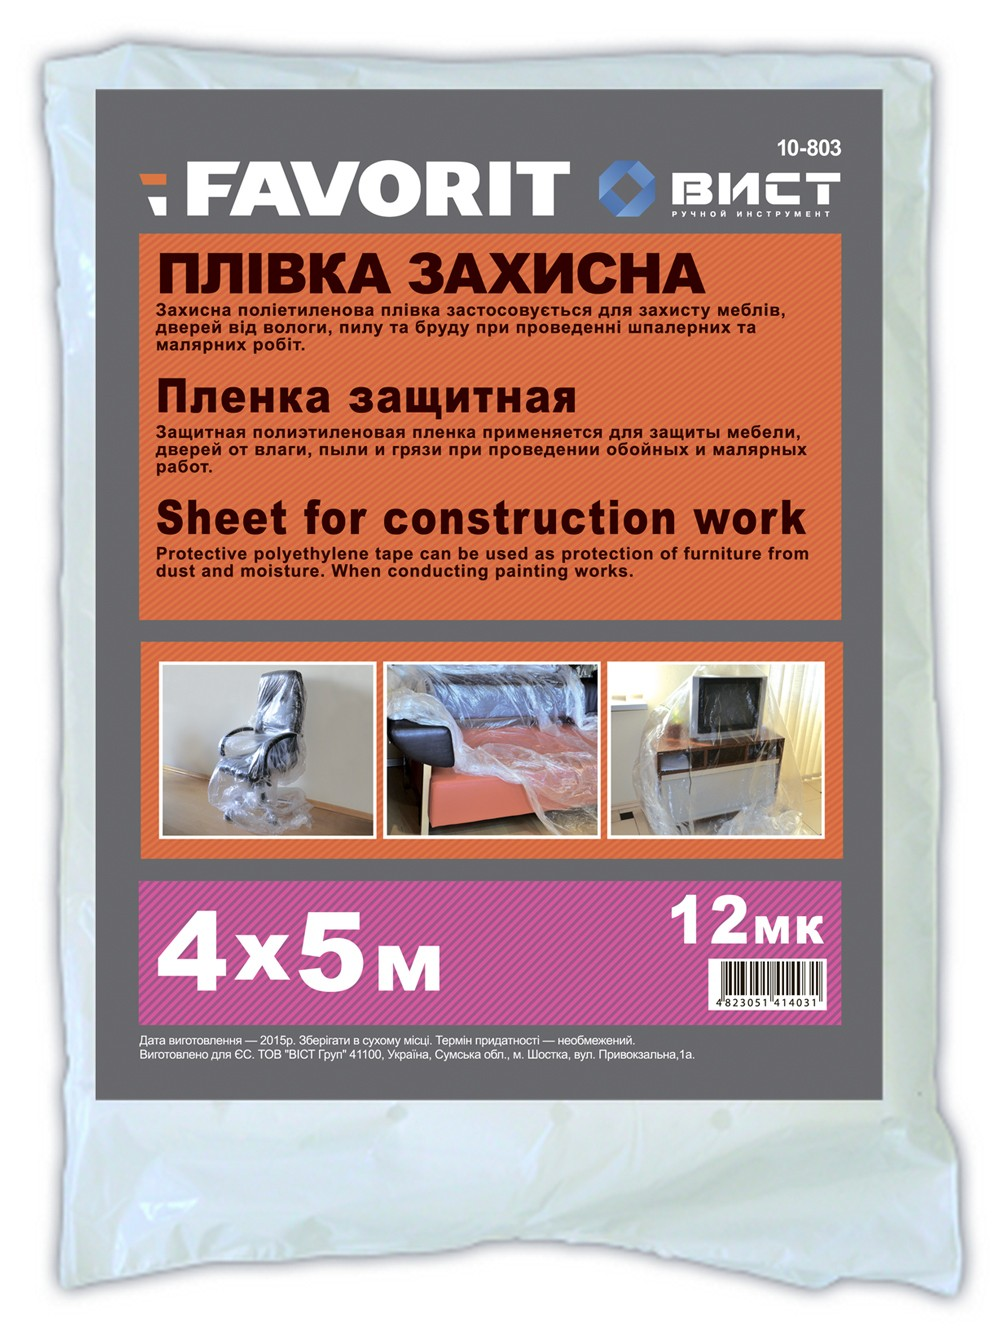 Защитная пленка FAVORIT 4 * 5м 12мк 10-803 - PRORAB image-1